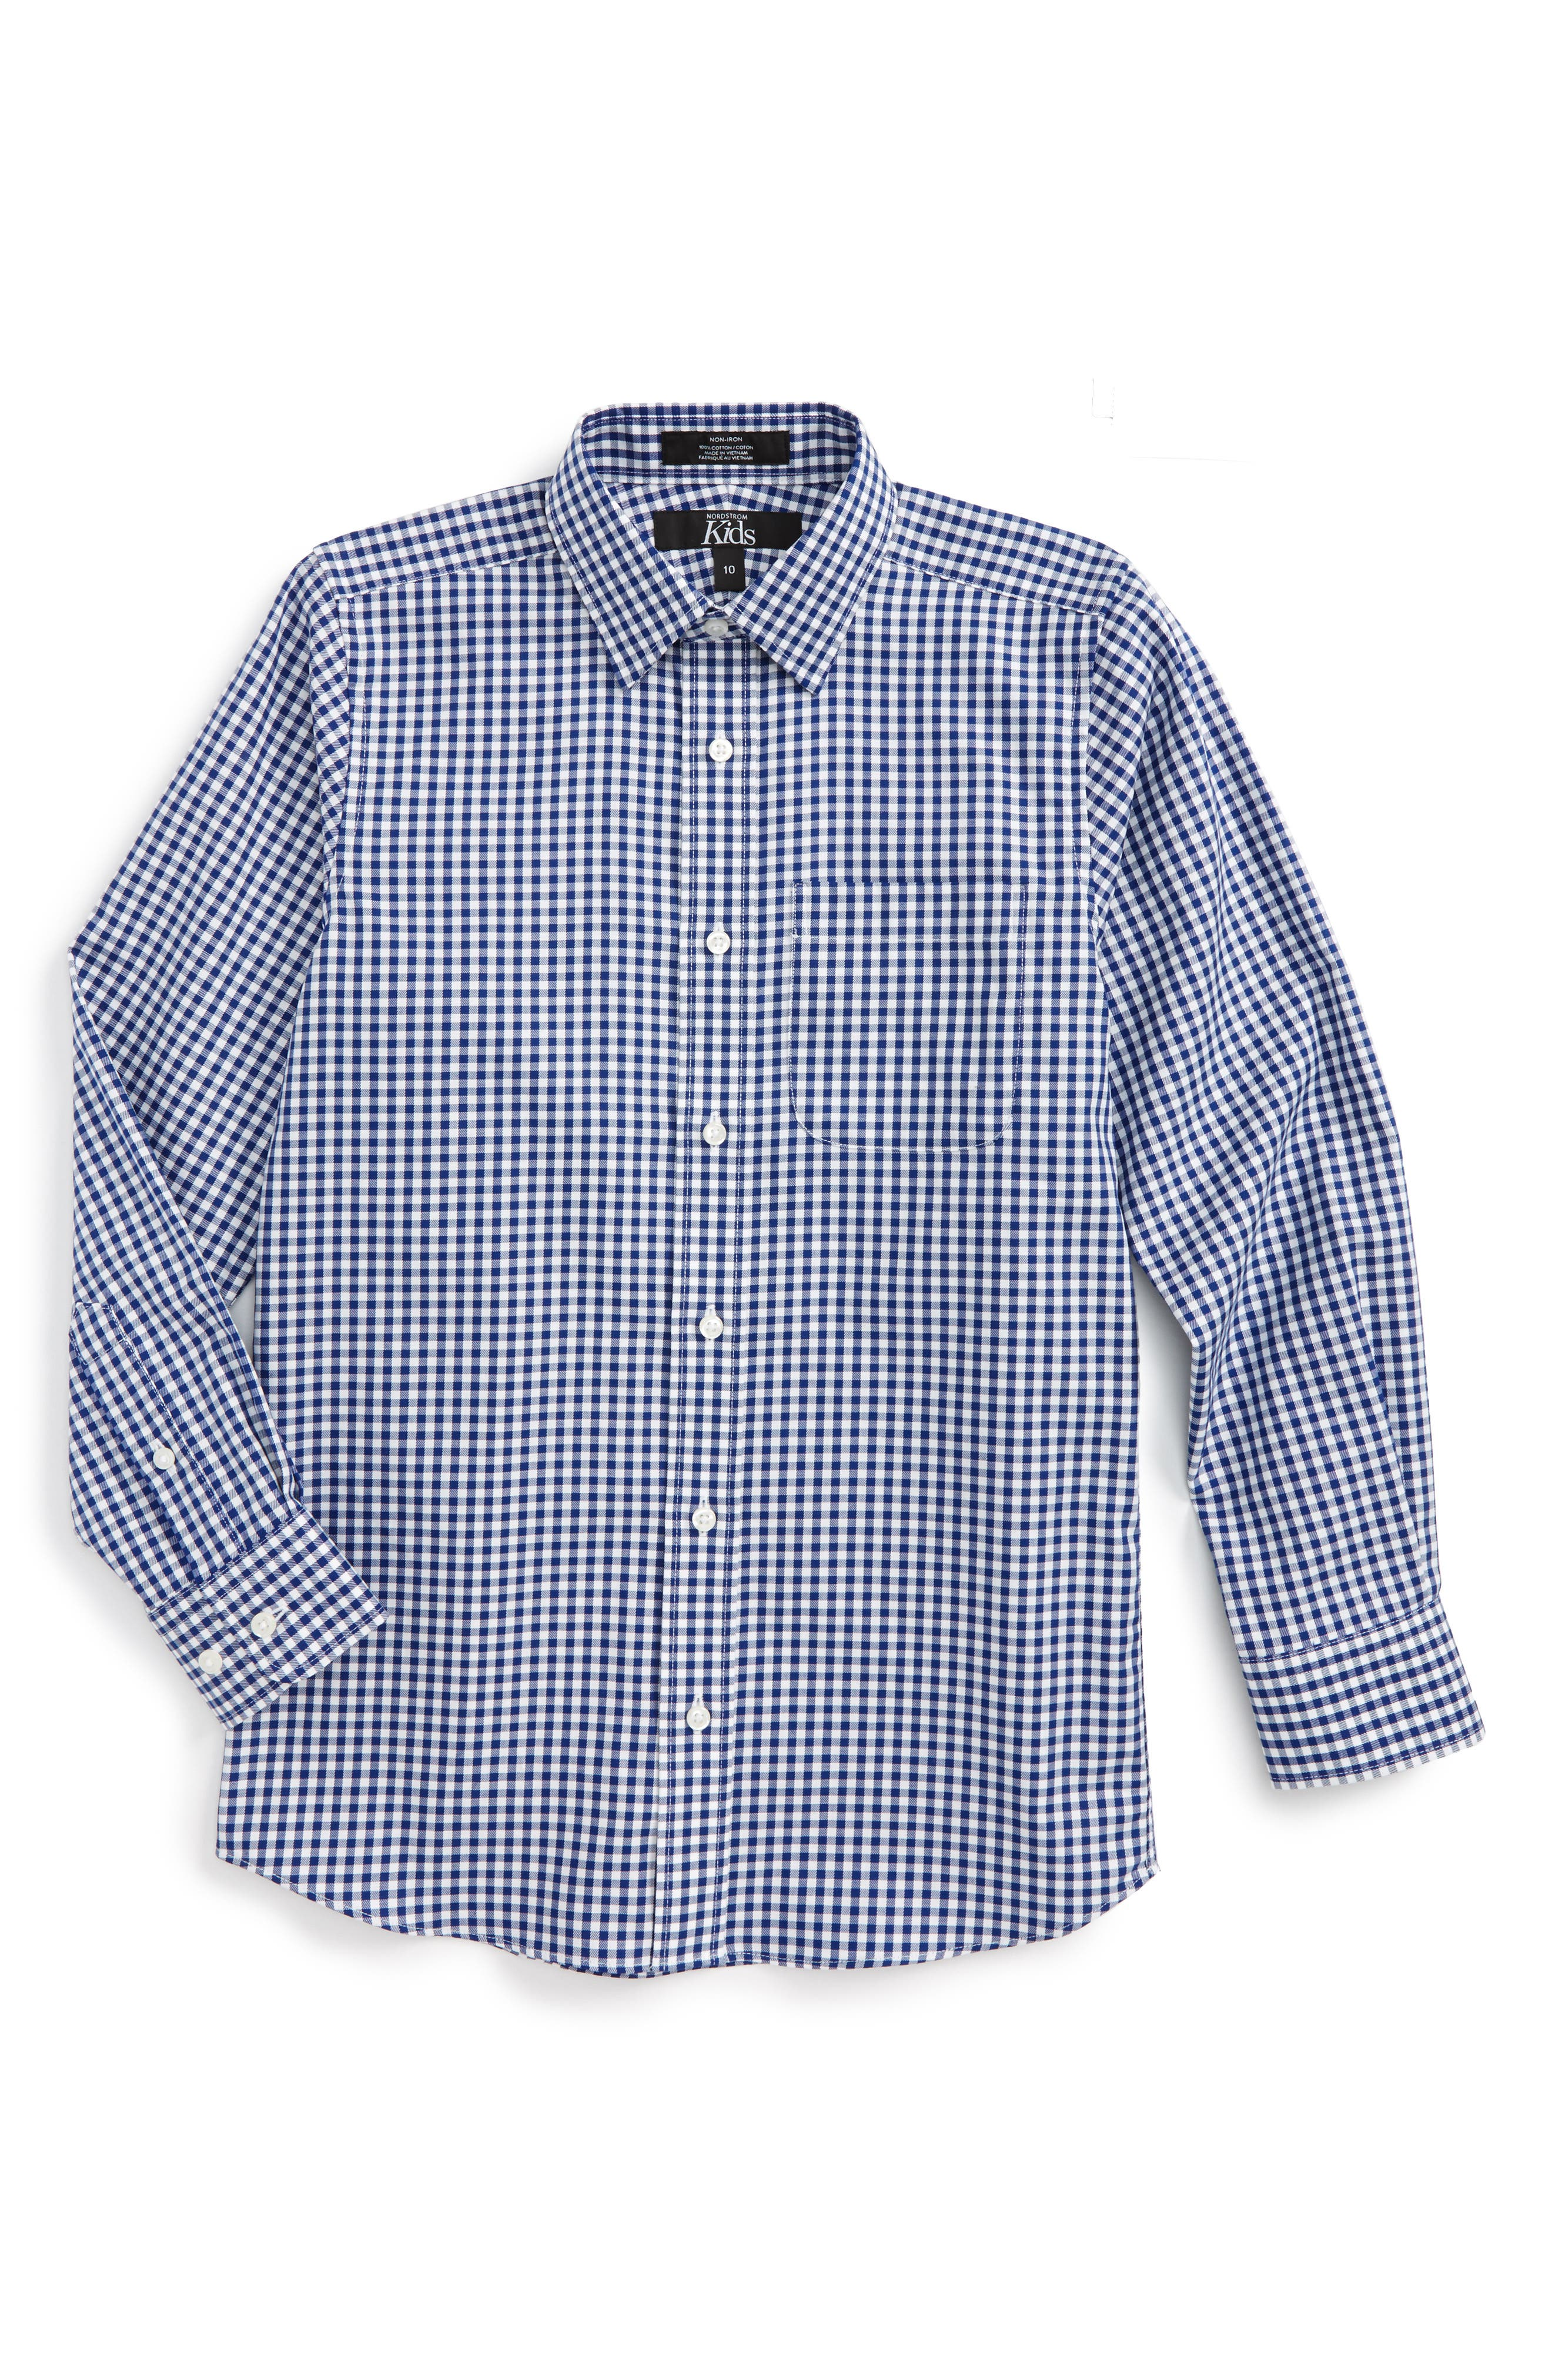 Non-Iron Check Dress Shirt,                         Main,                         color, Navy Patriot